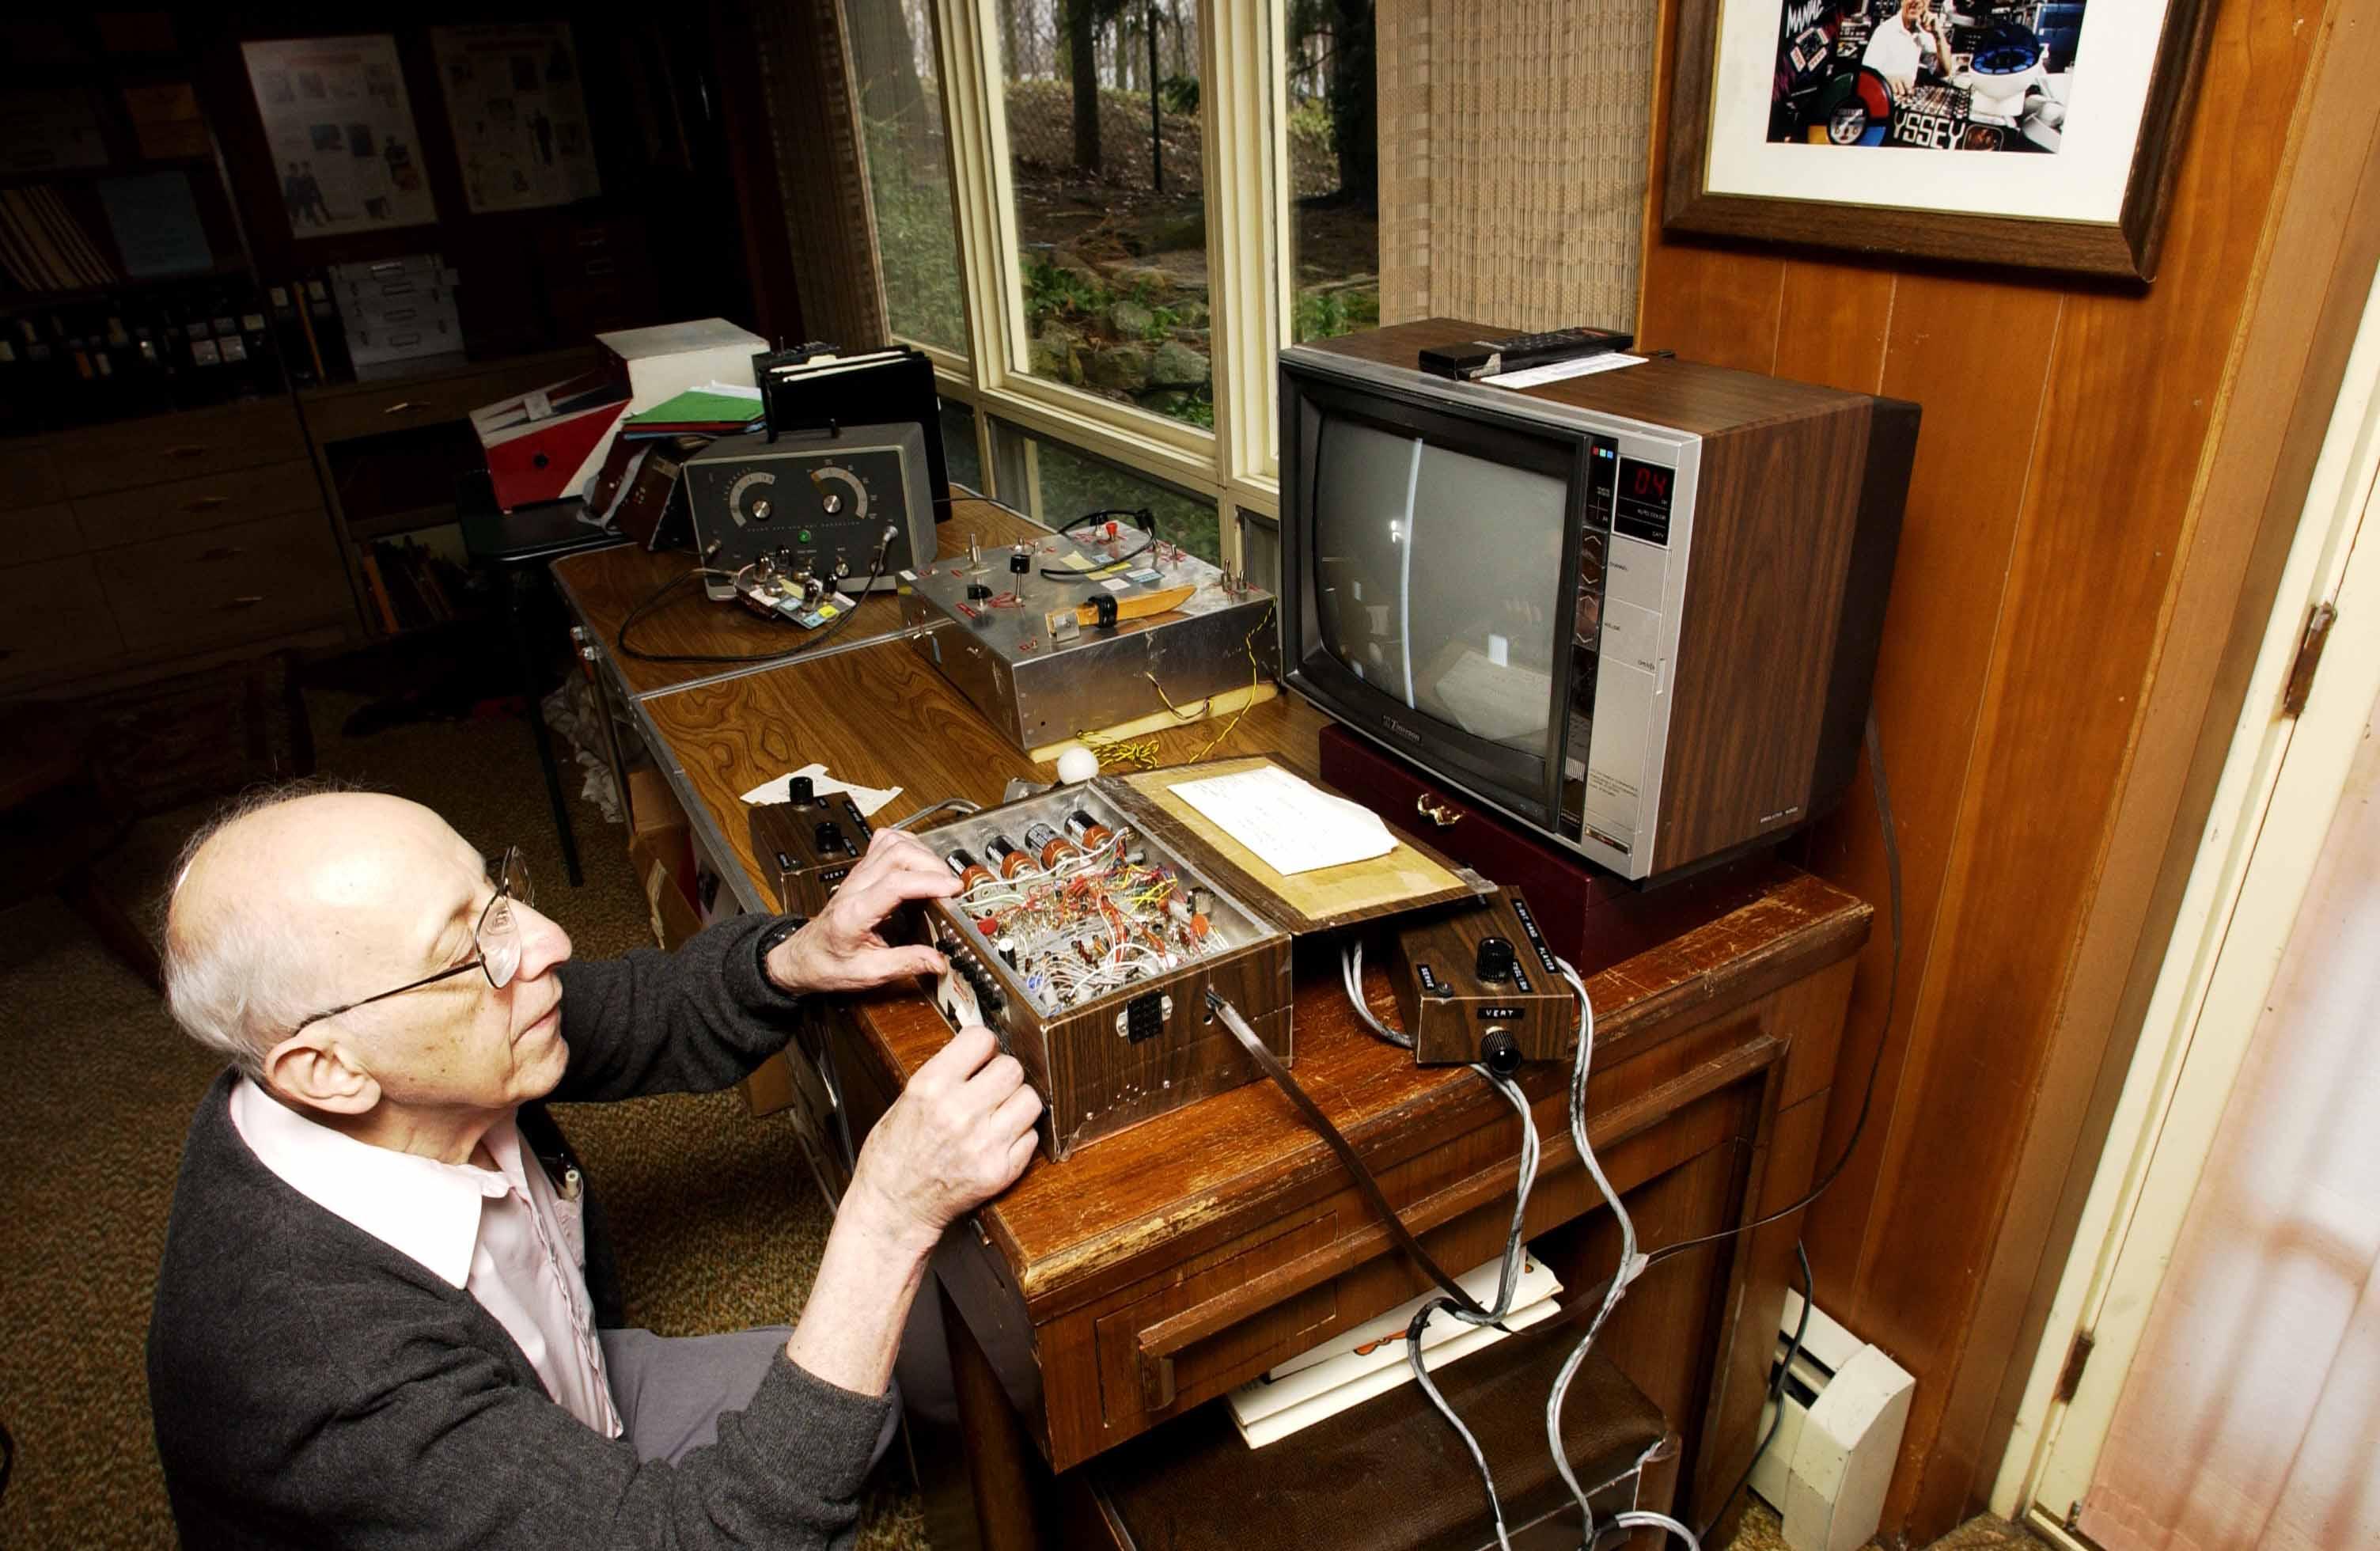 Baer demonstrating his original video game equipment in 2003.